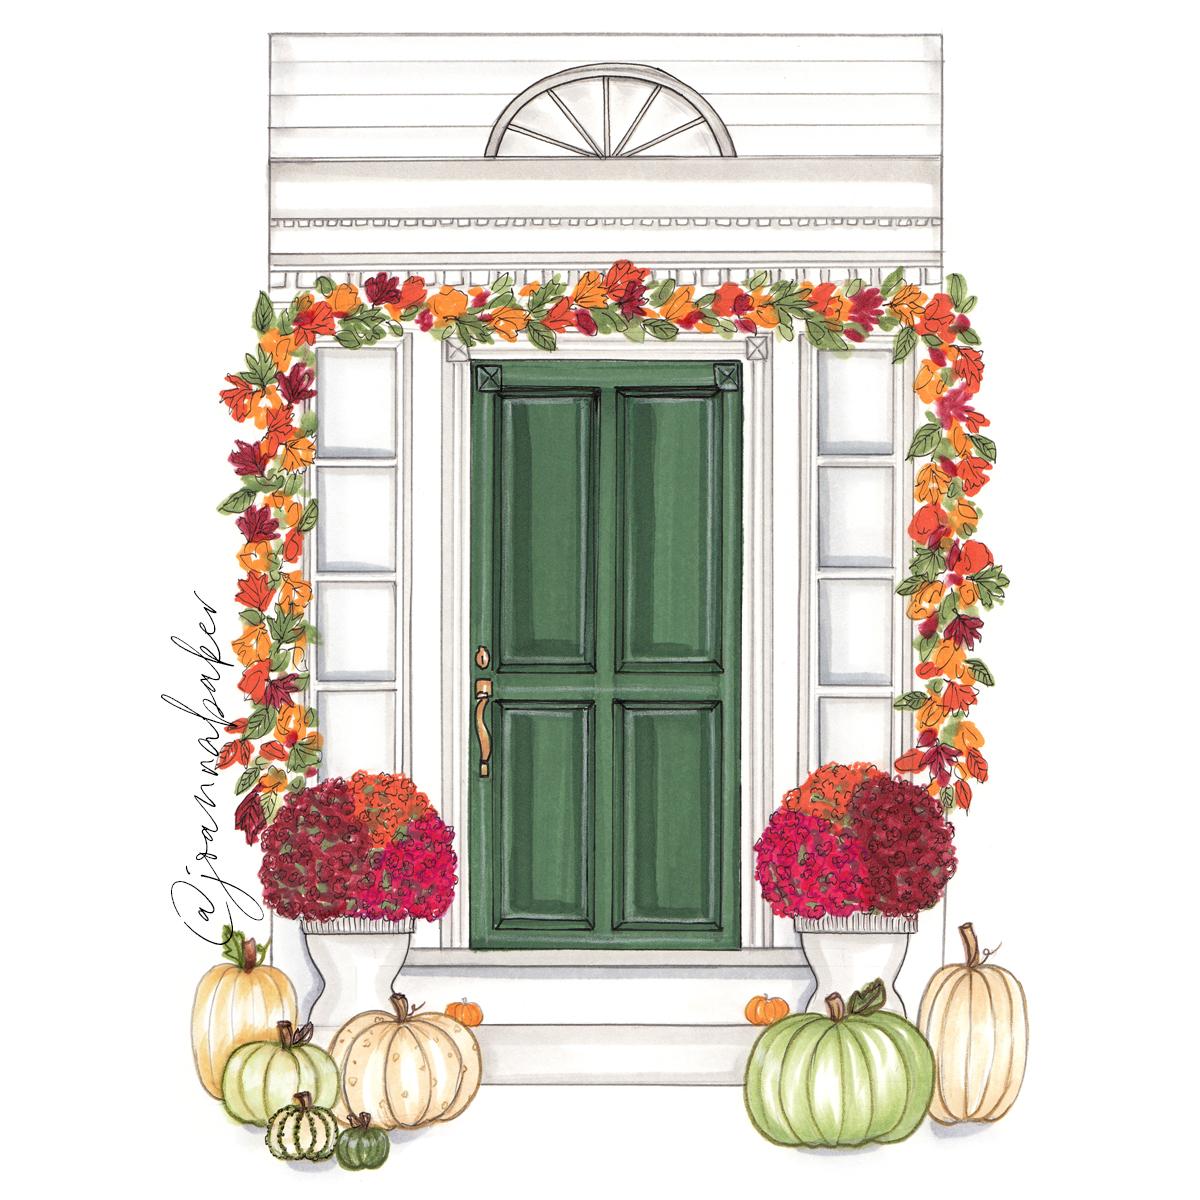 Fall Dream Home Illustration by Joanna Baker